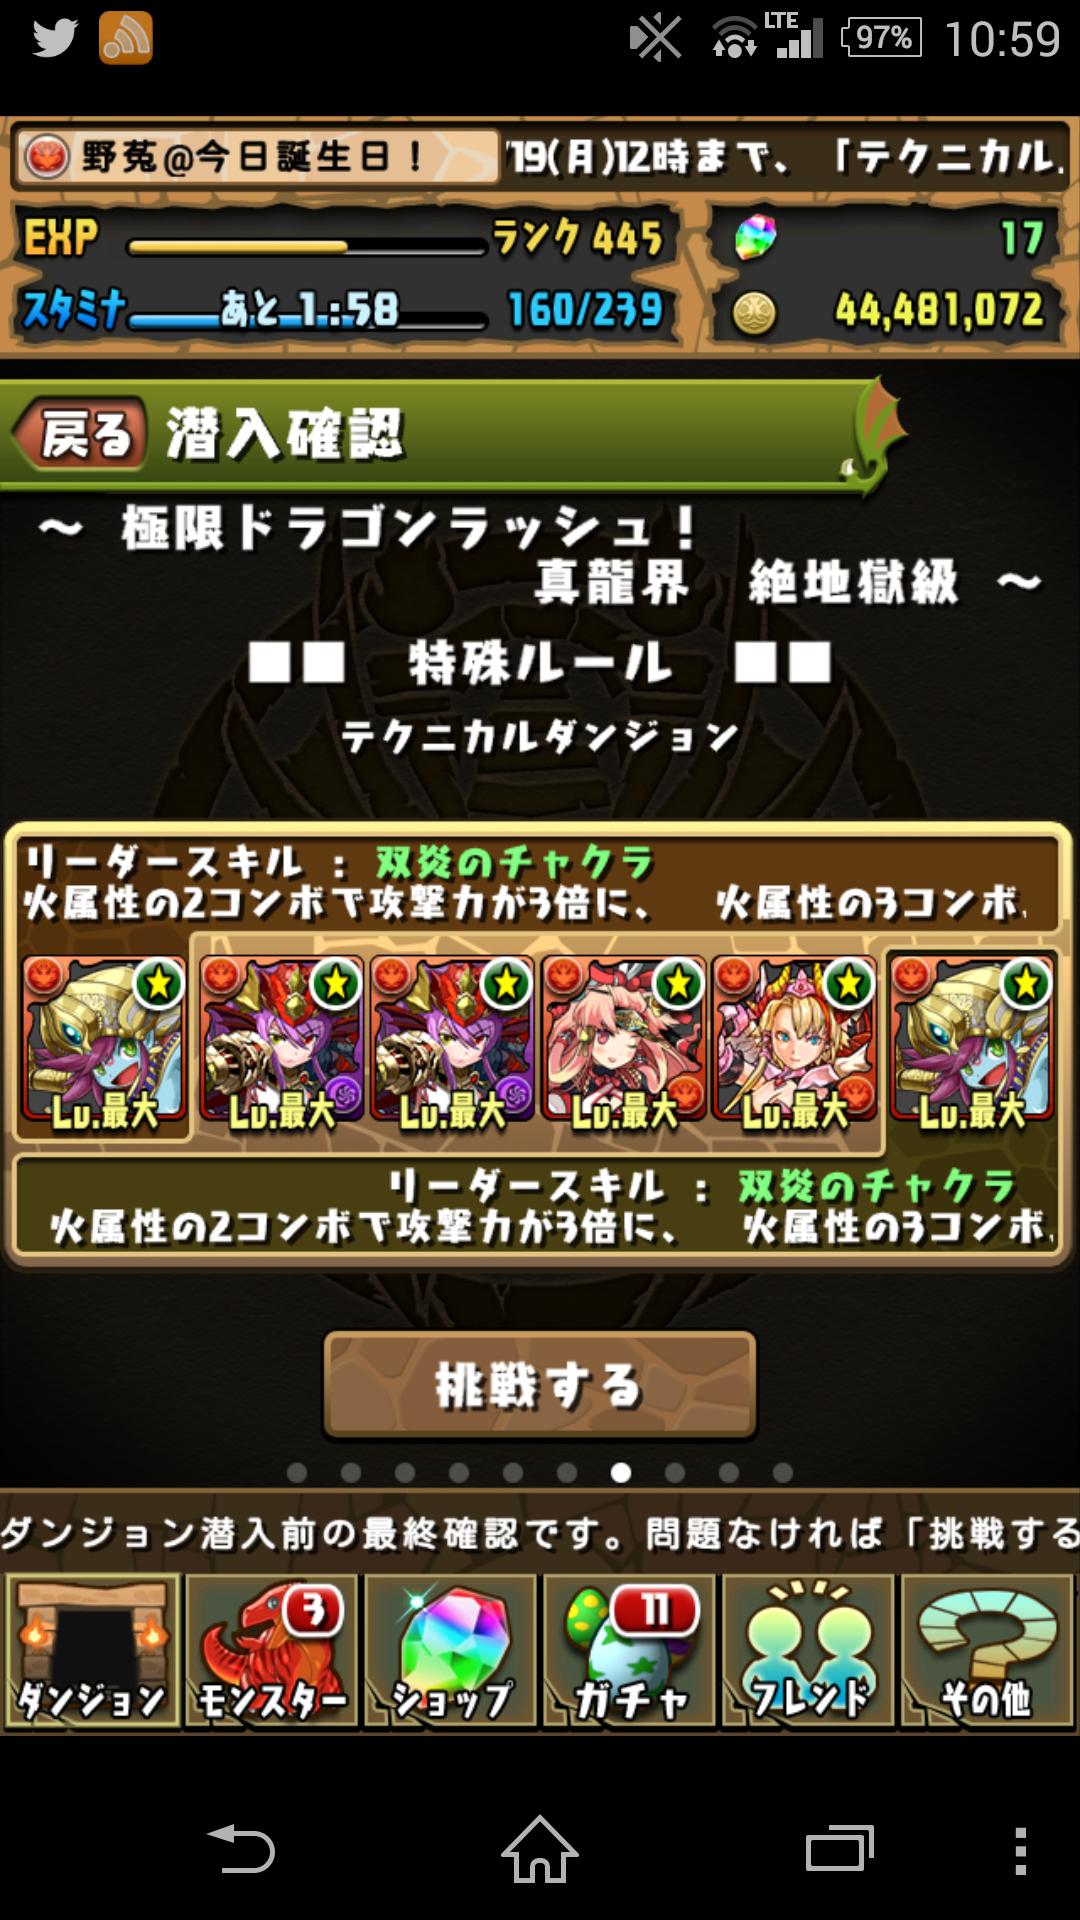 Screenshot_2015-01-17-10-59-04.png